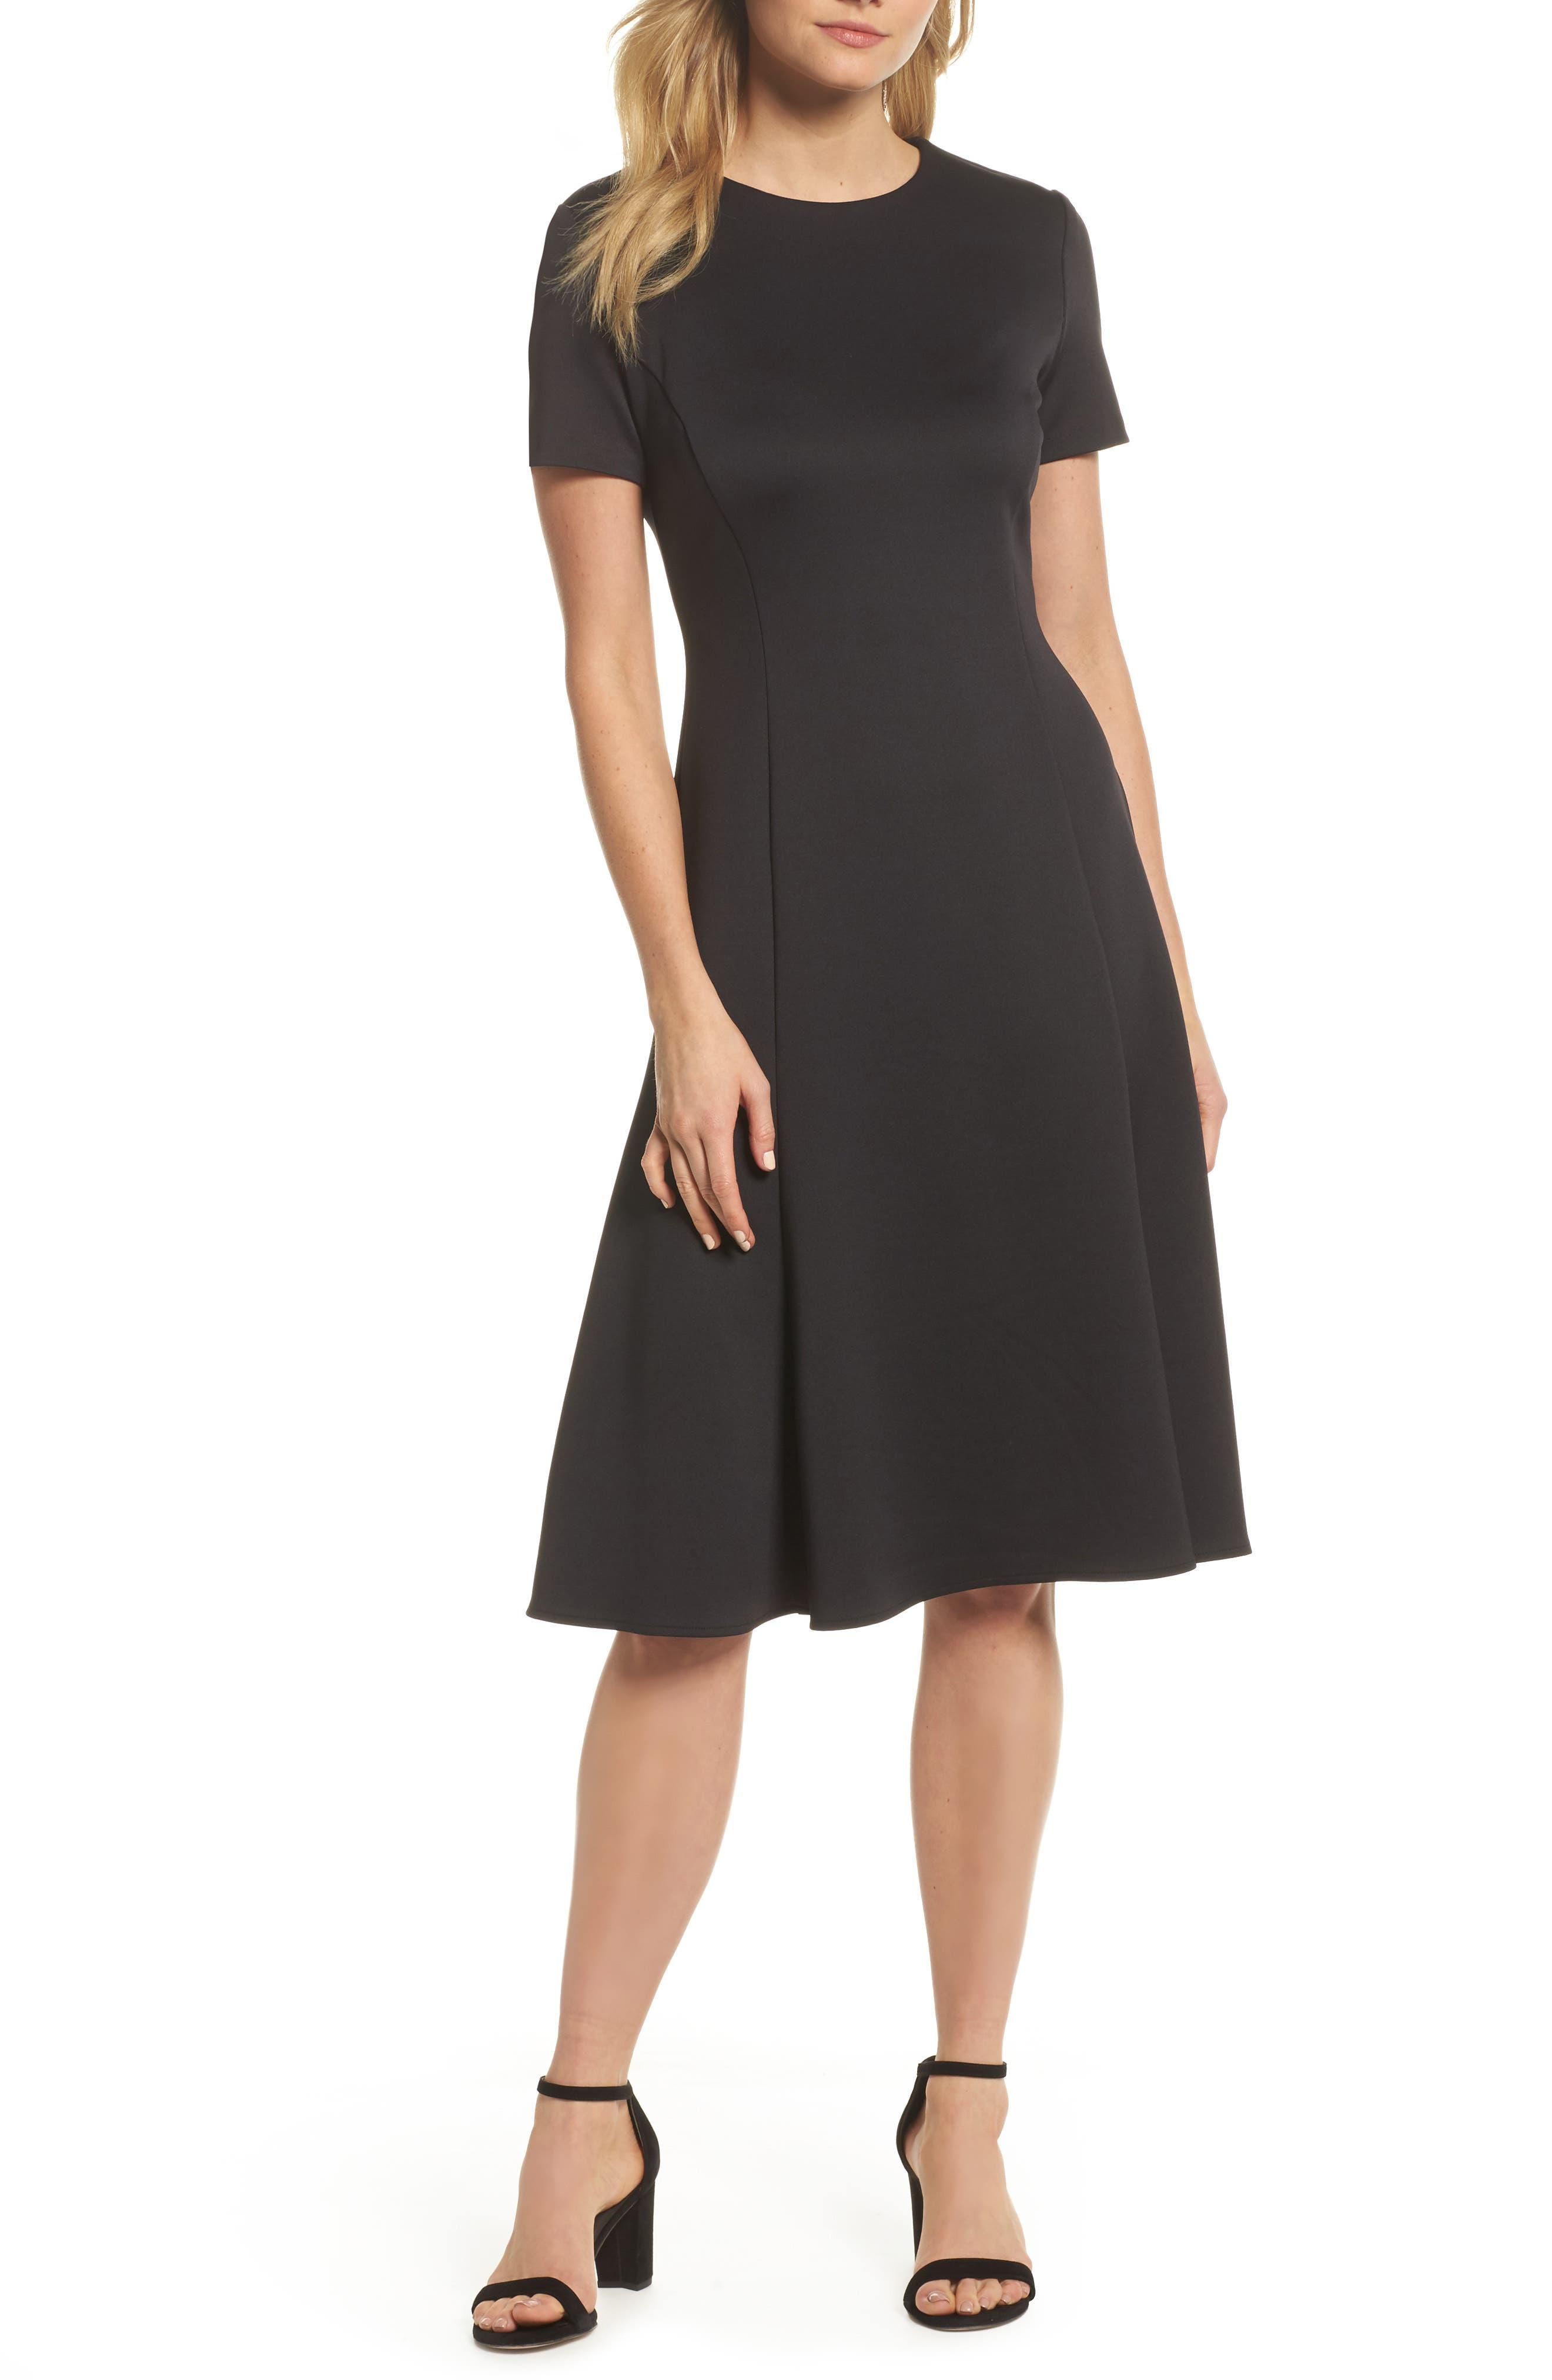 Midi Bell Dress,                         Main,                         color, 001